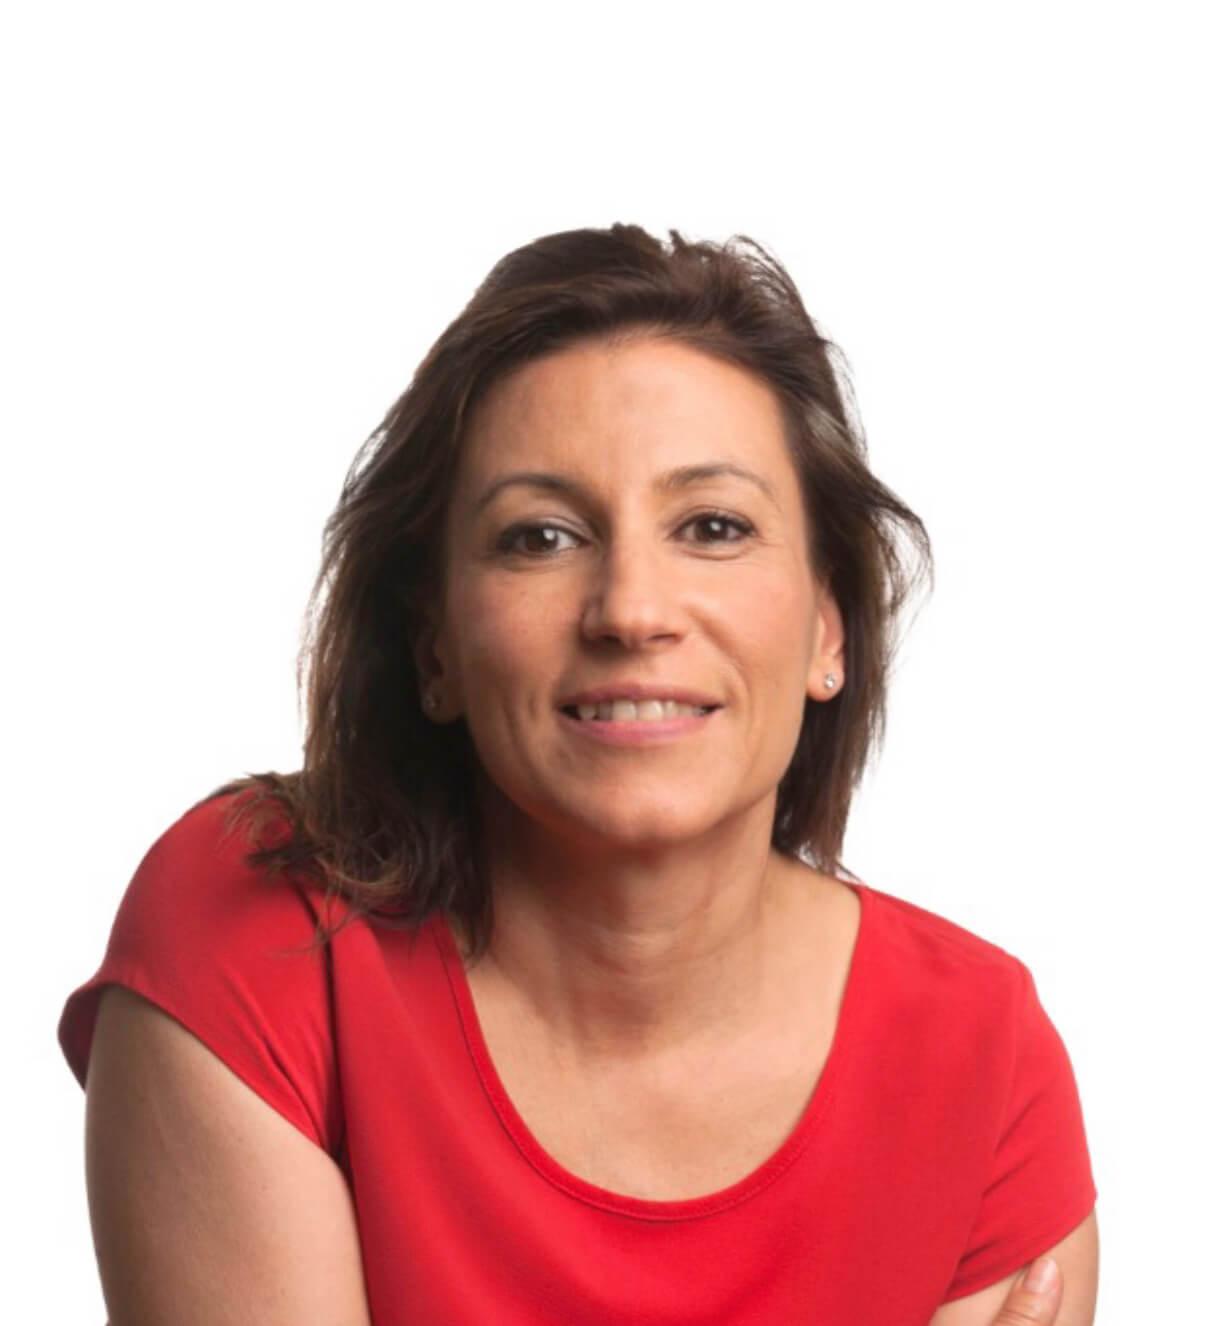 Daniela Soulution